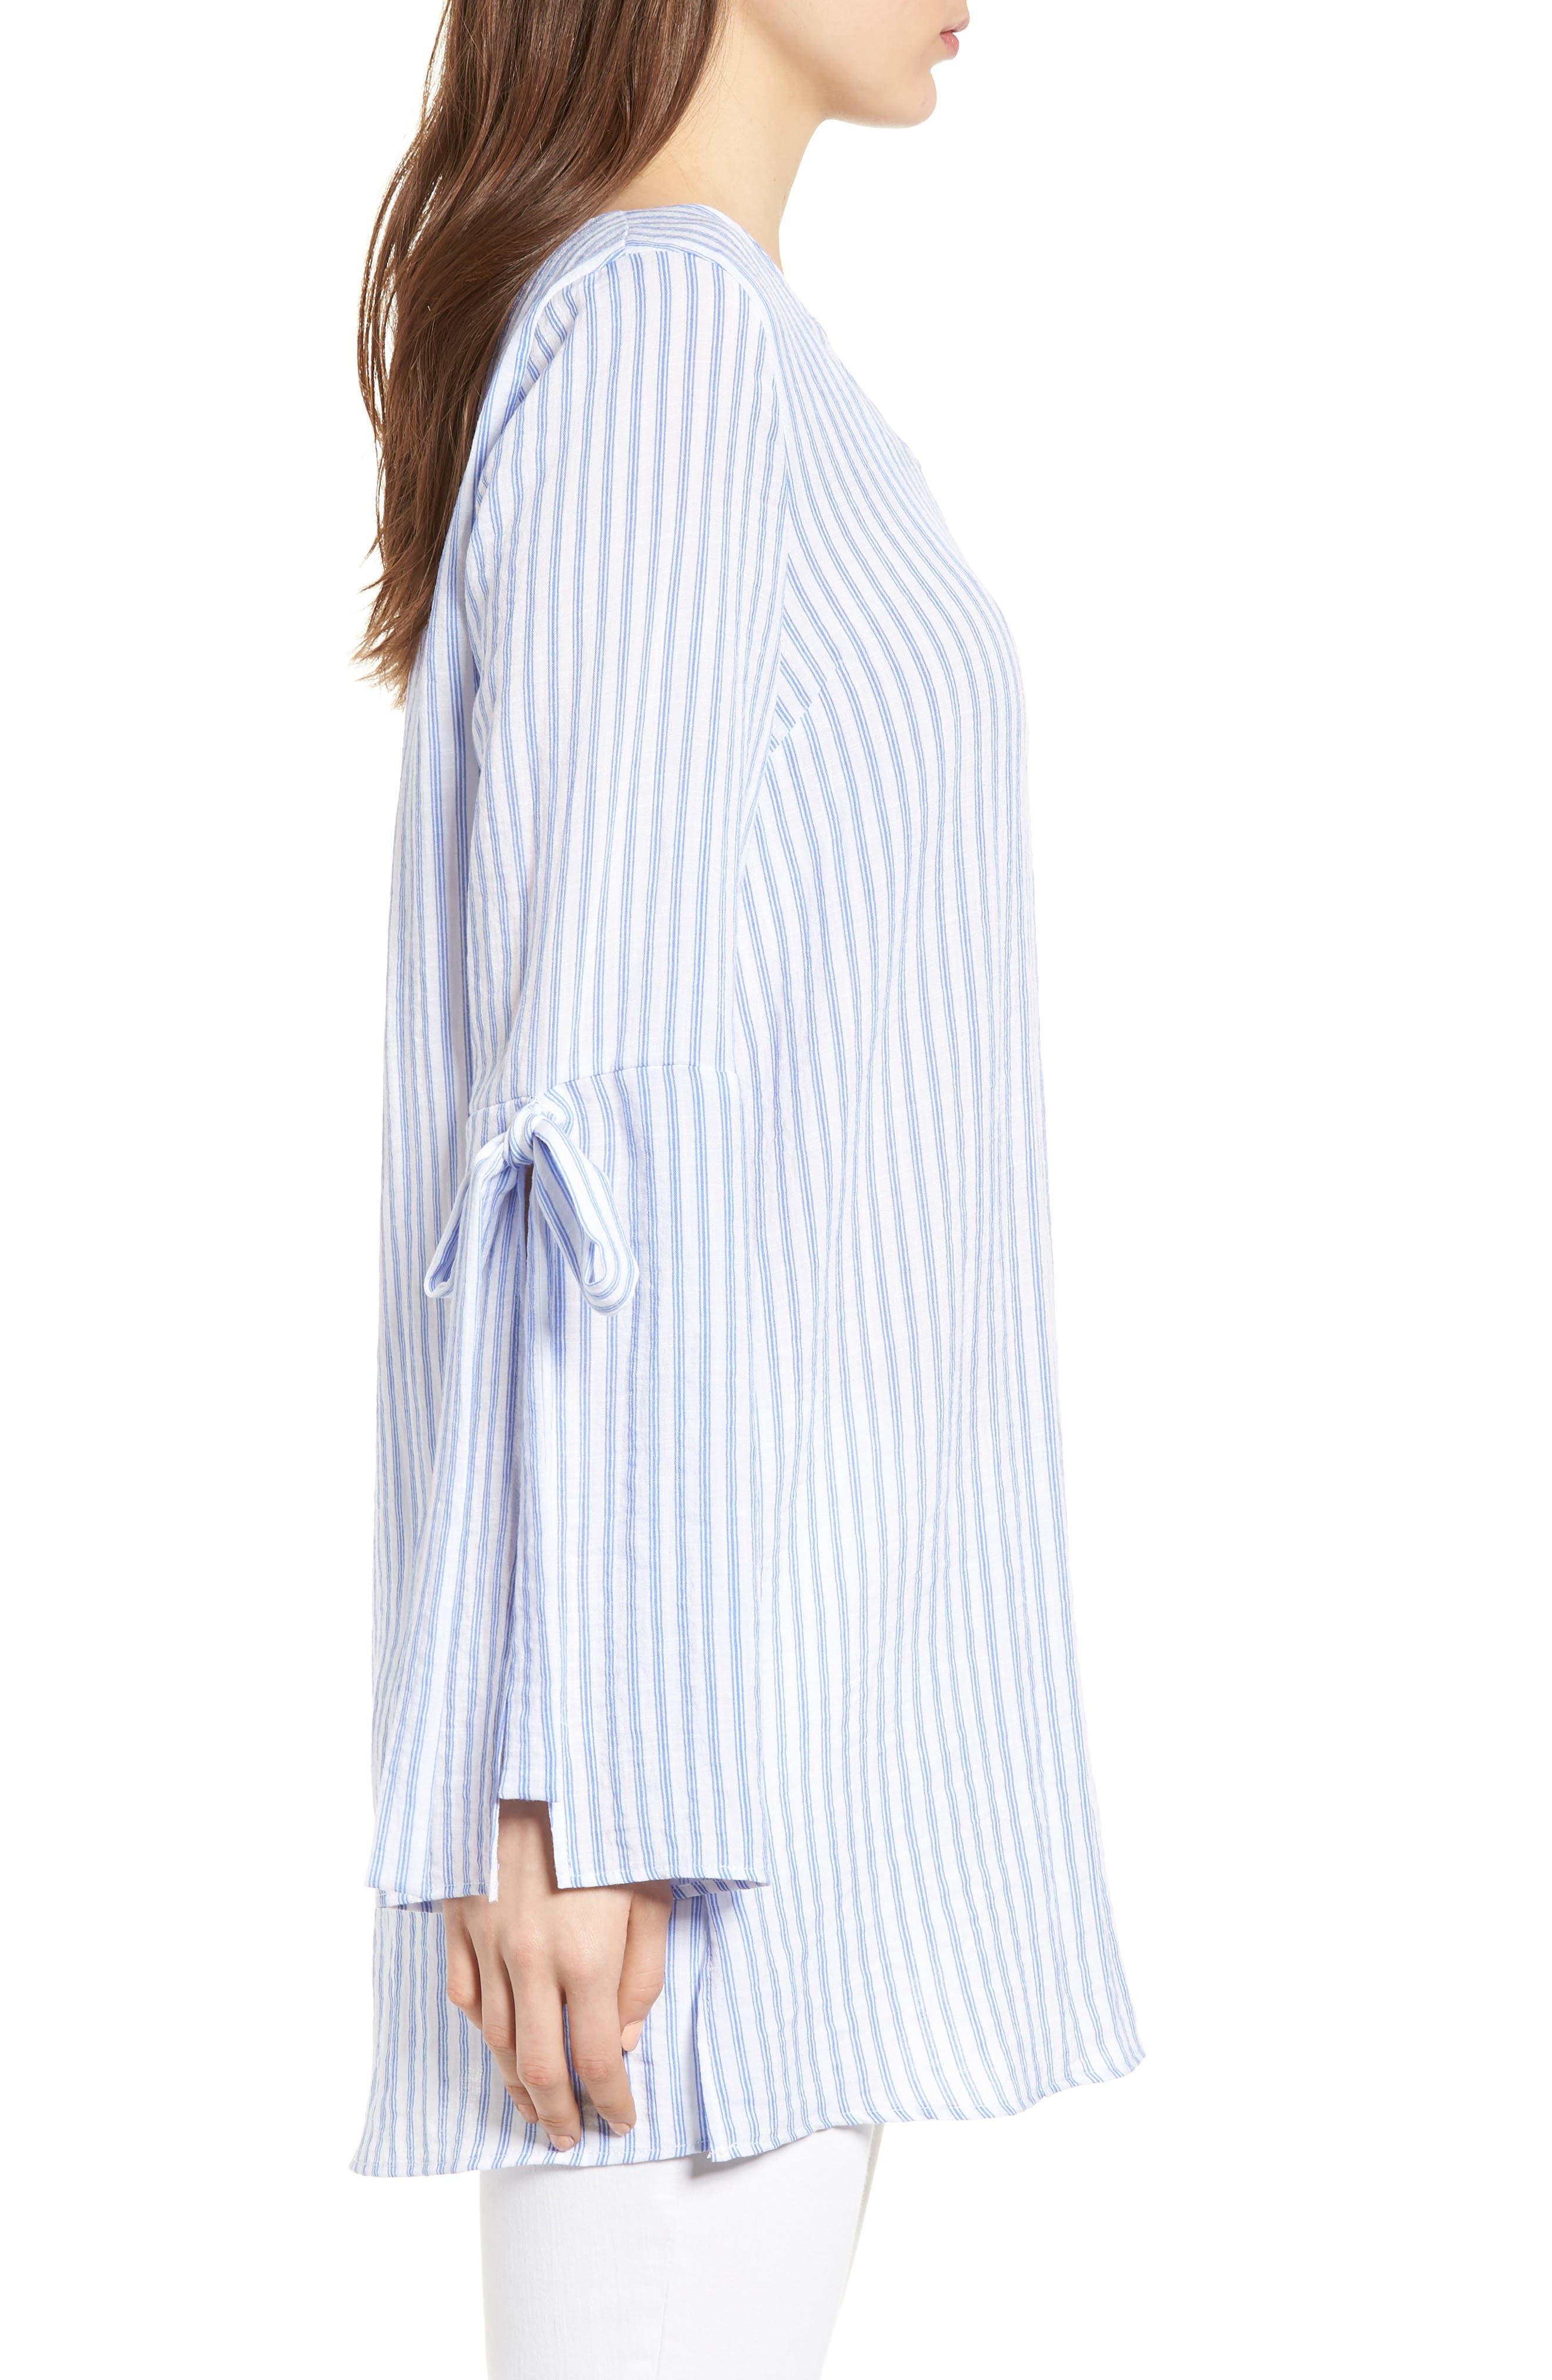 Bishop + Young Stripe Tunic Top,                             Alternate thumbnail 3, color,                             Blue White Stripe